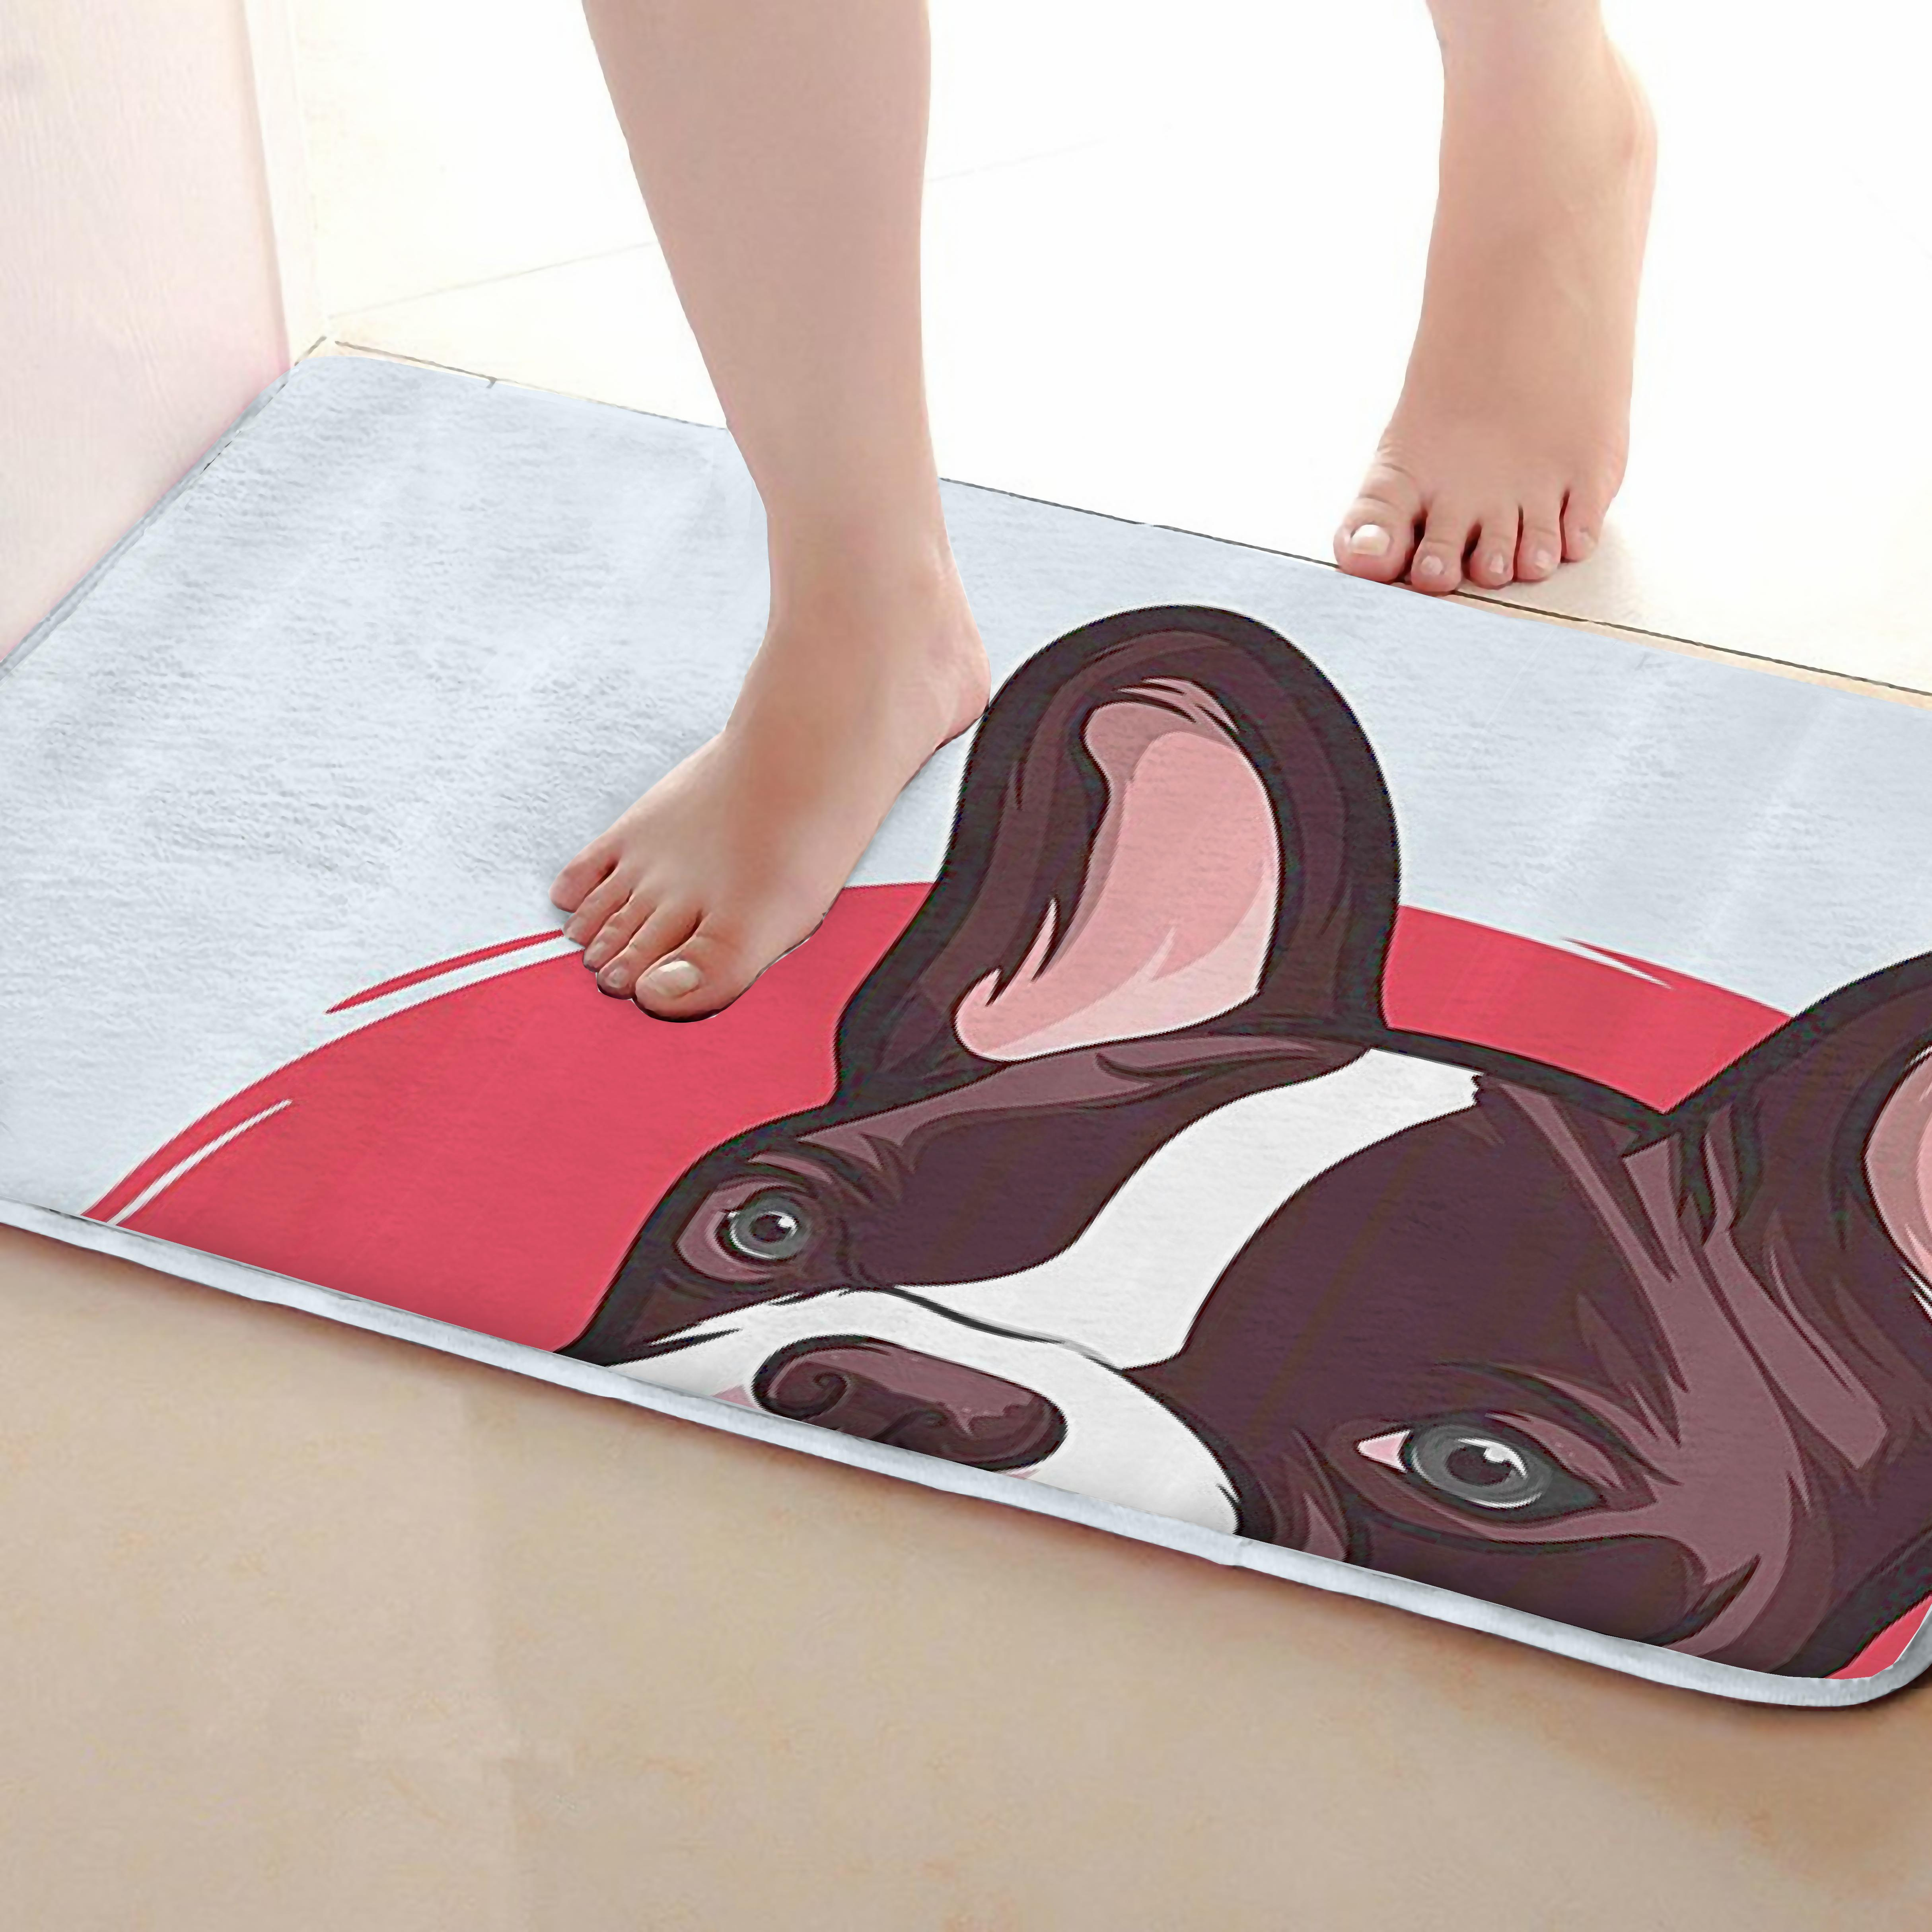 Dog Style Bathroom Mat,Funny Anti Skid Bath Mat,Shower